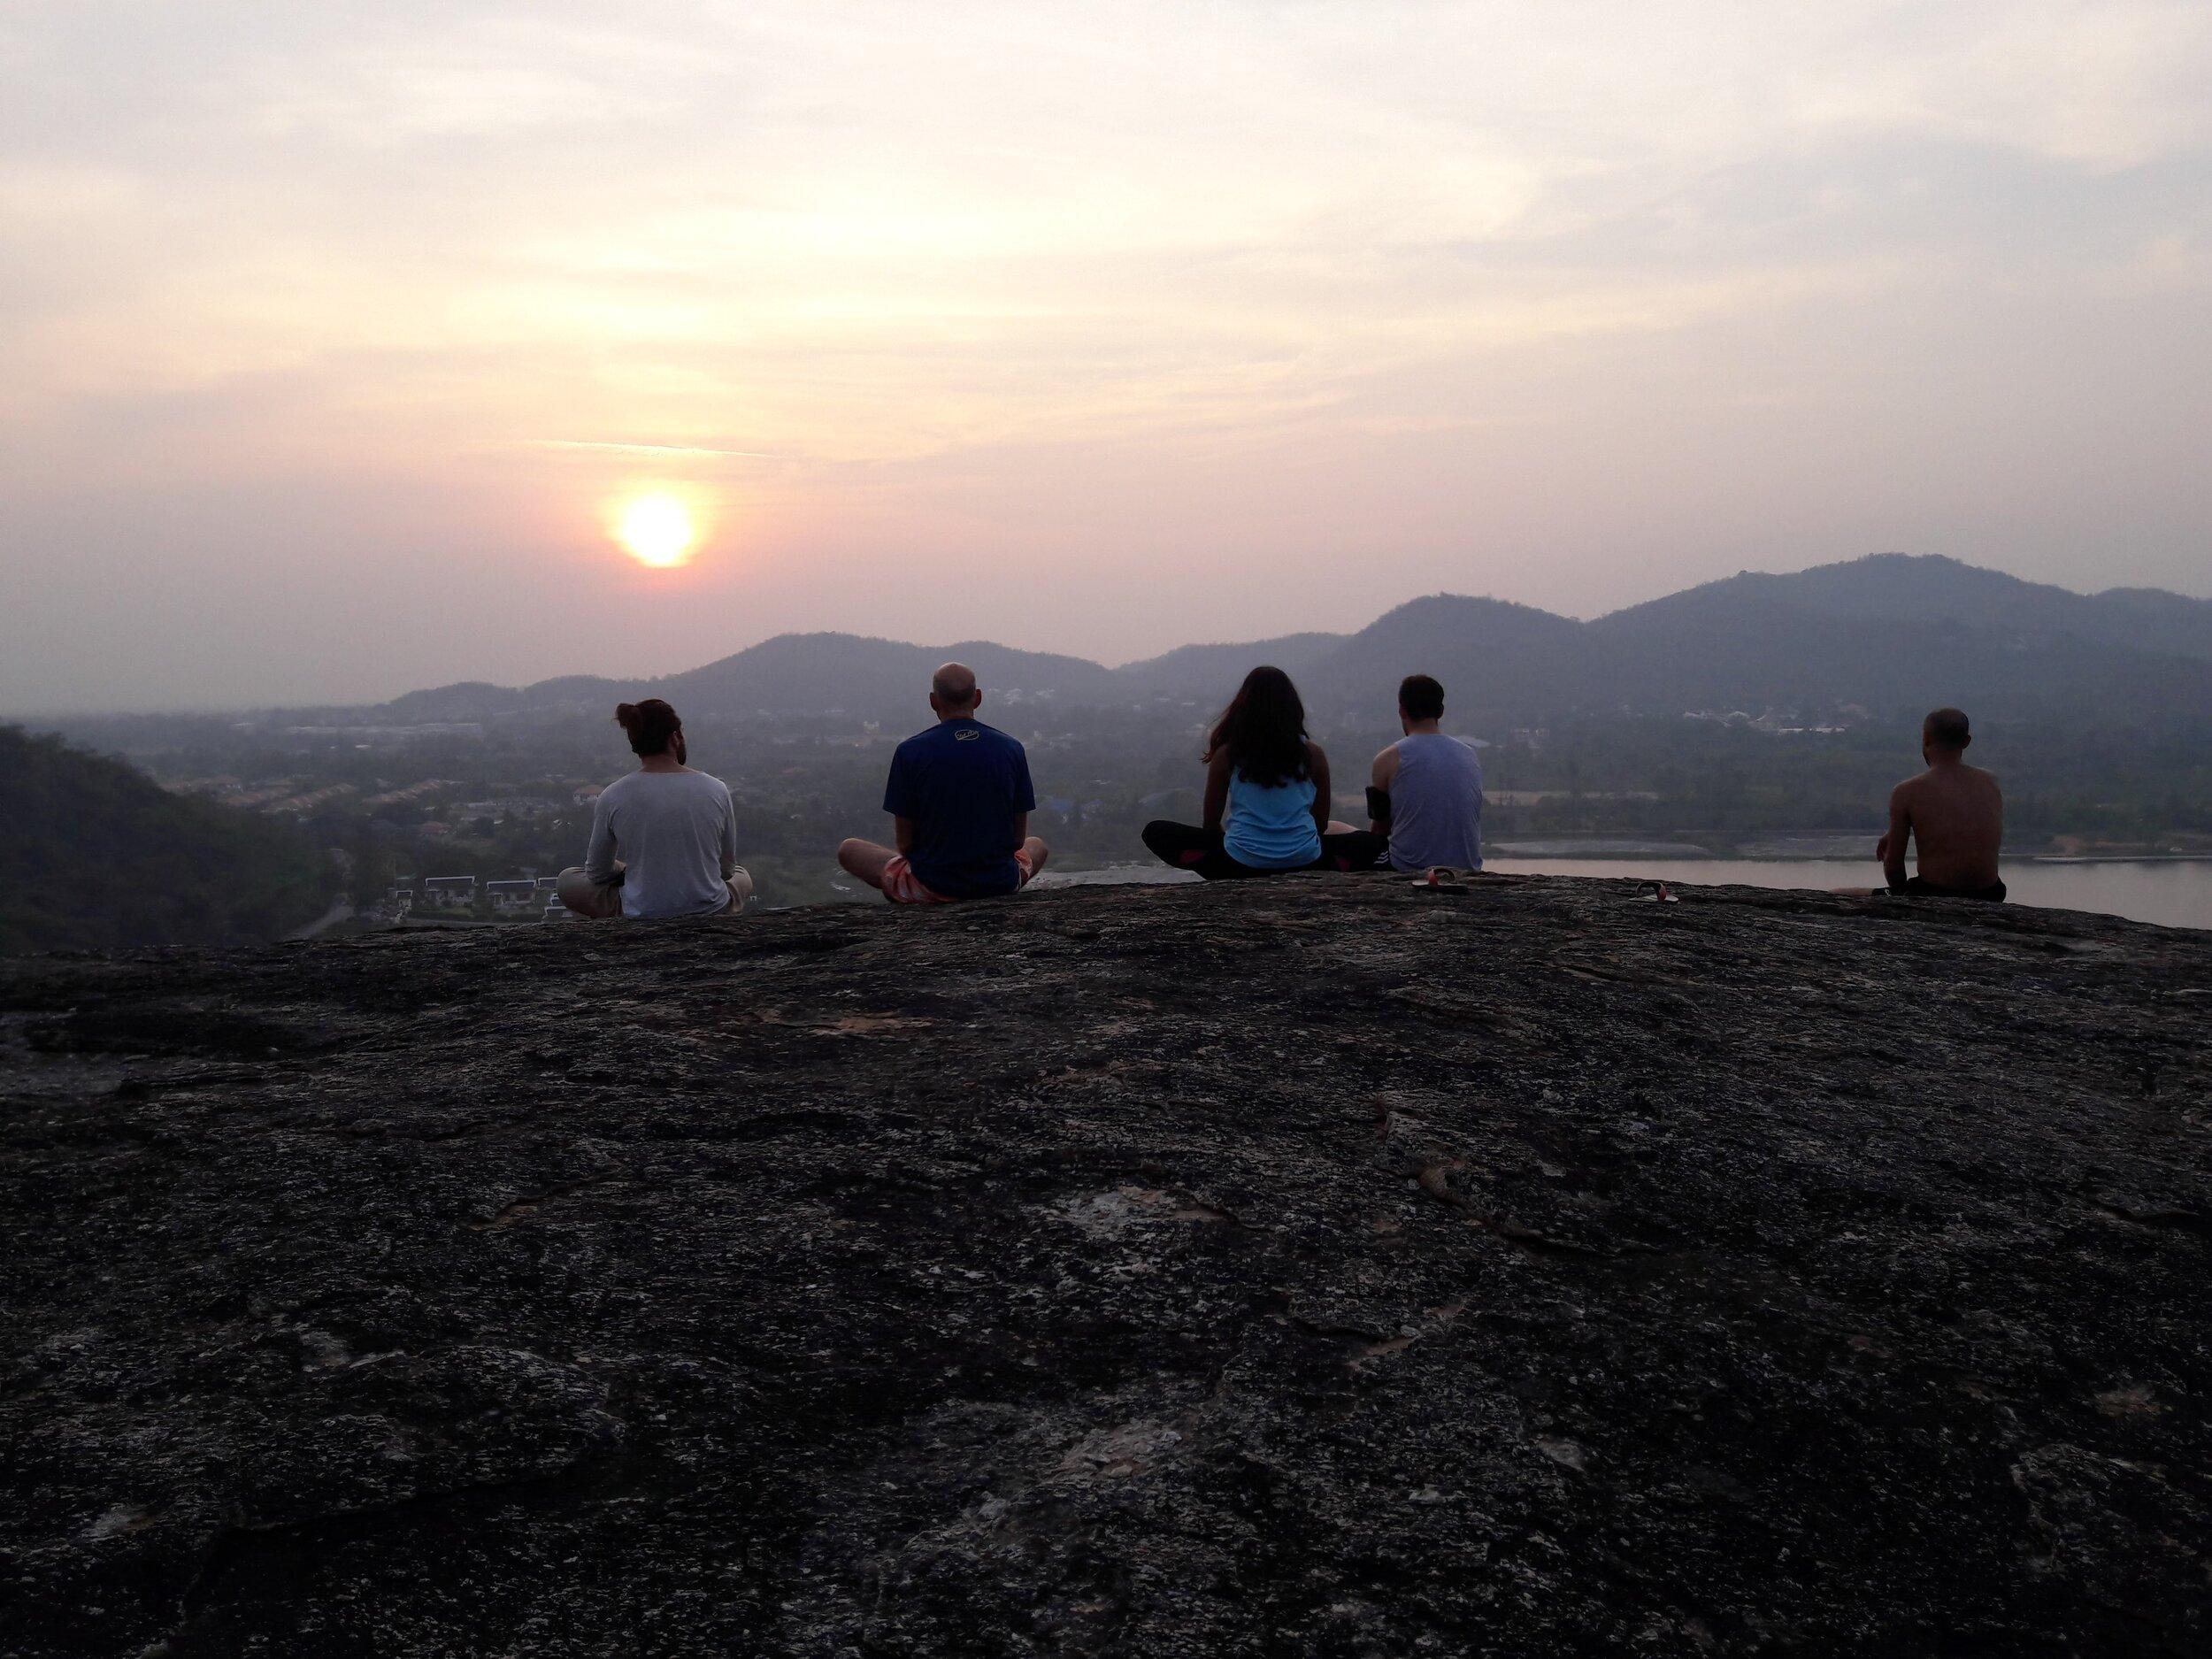 olive retreat sunset mountain meditation.jpg